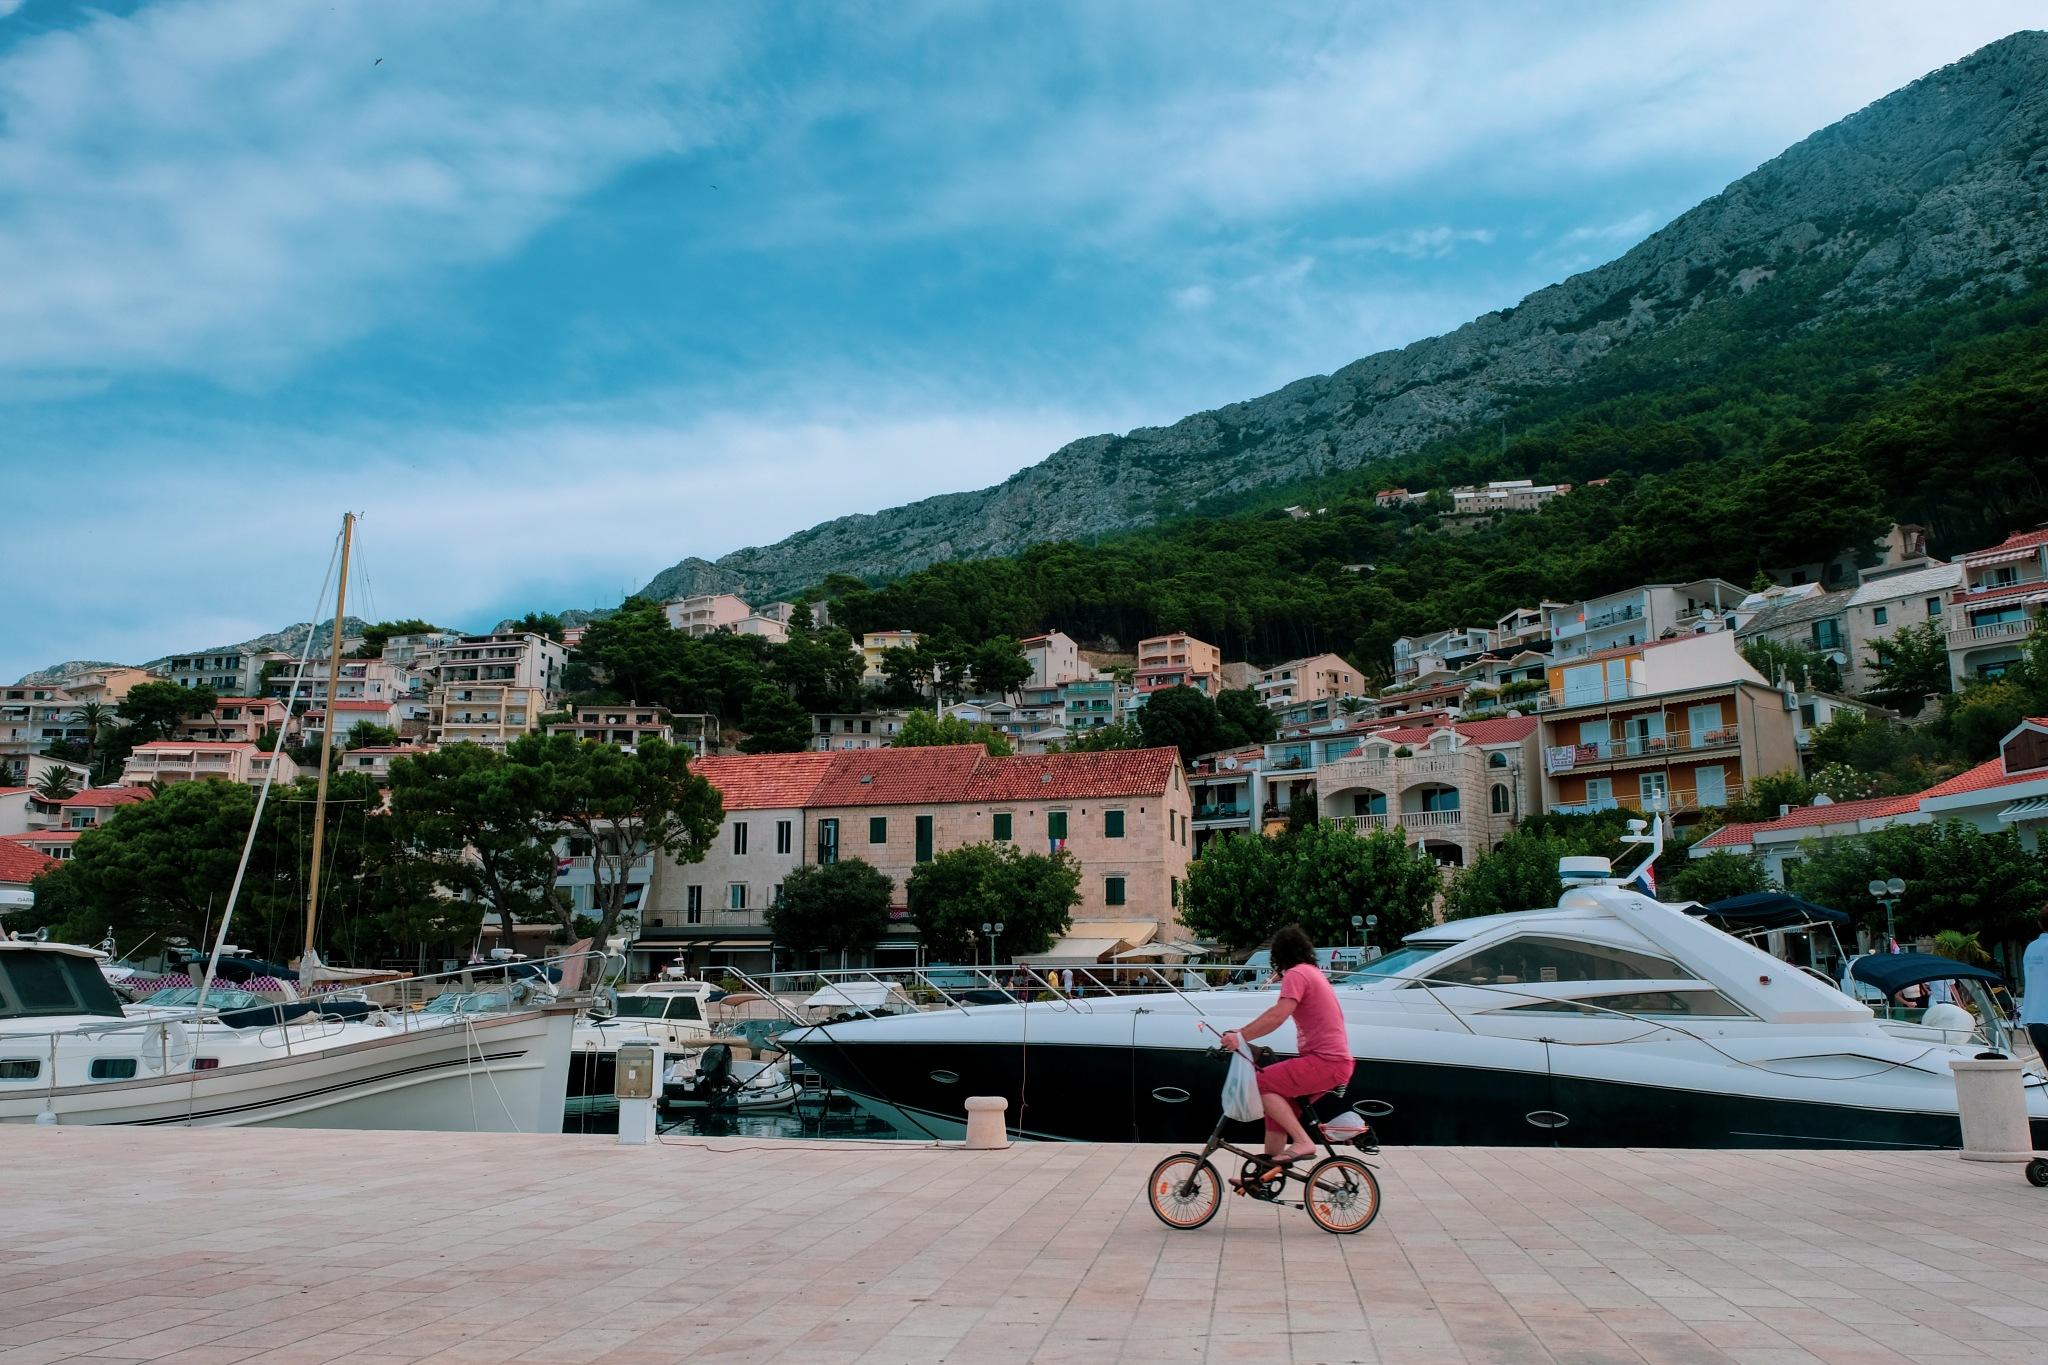 Lonely , rich biker by Goran Jorganovich